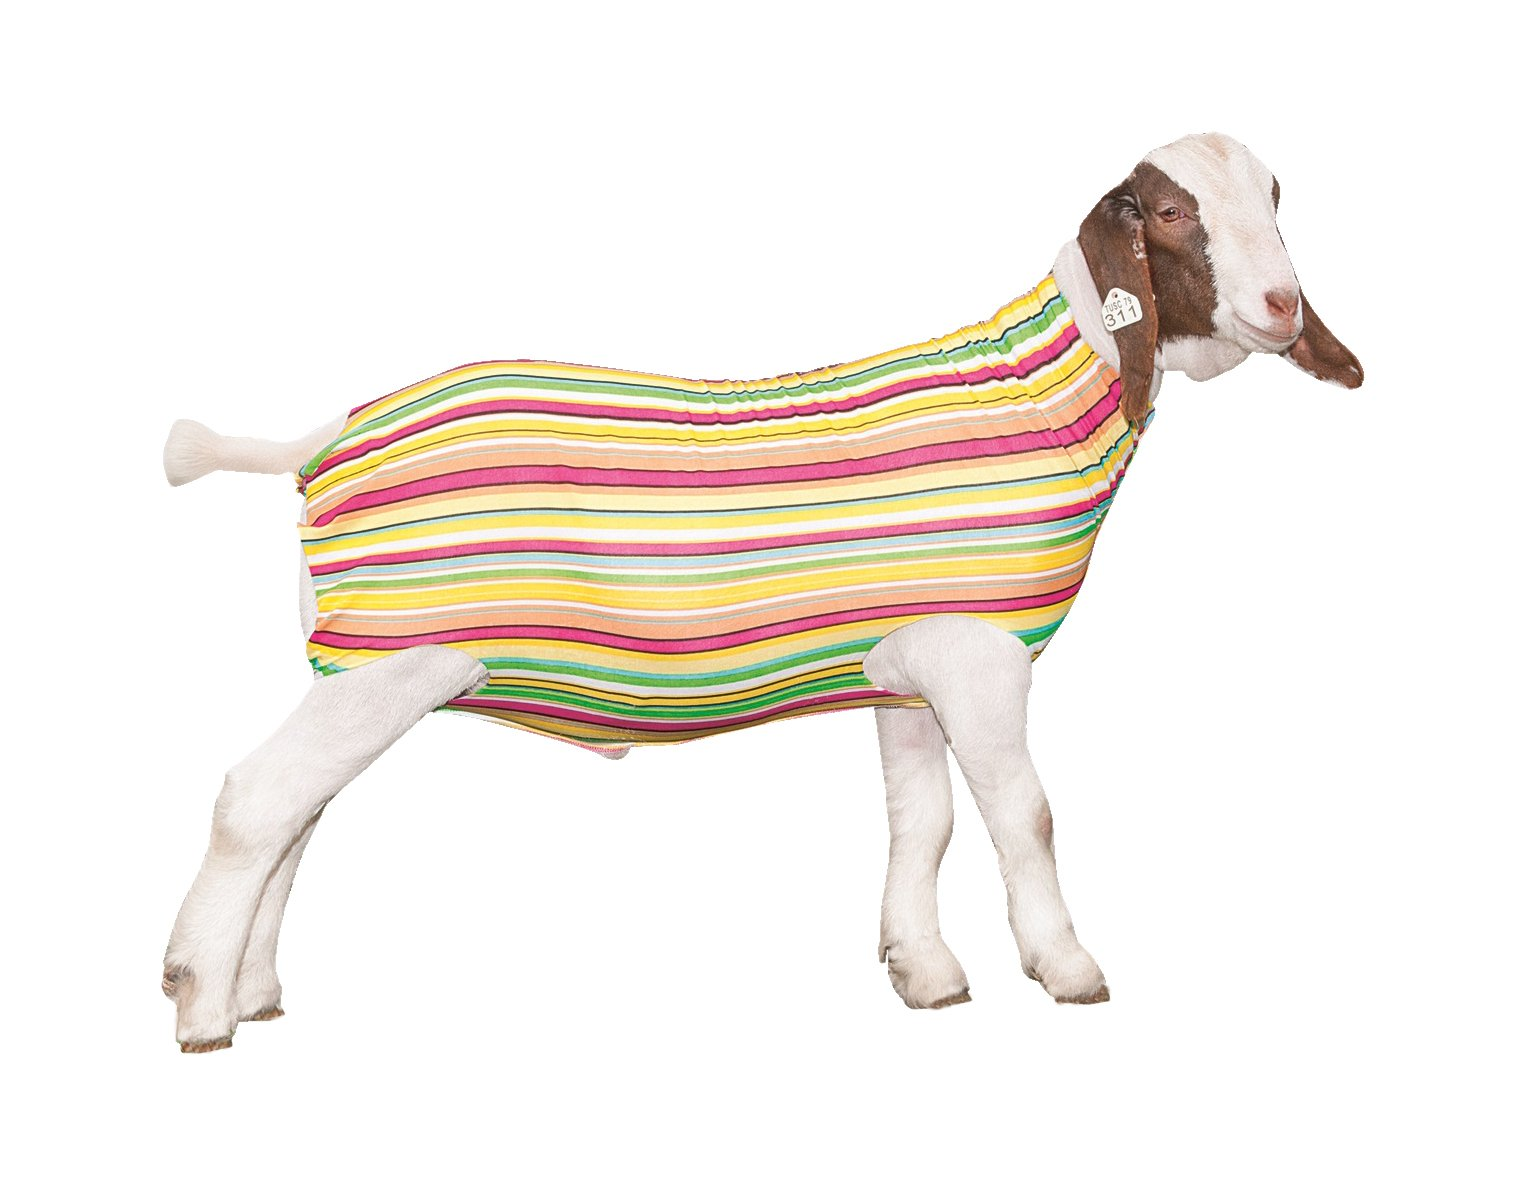 Weaver Leather Livestock Patterned Spandex Goat Tube